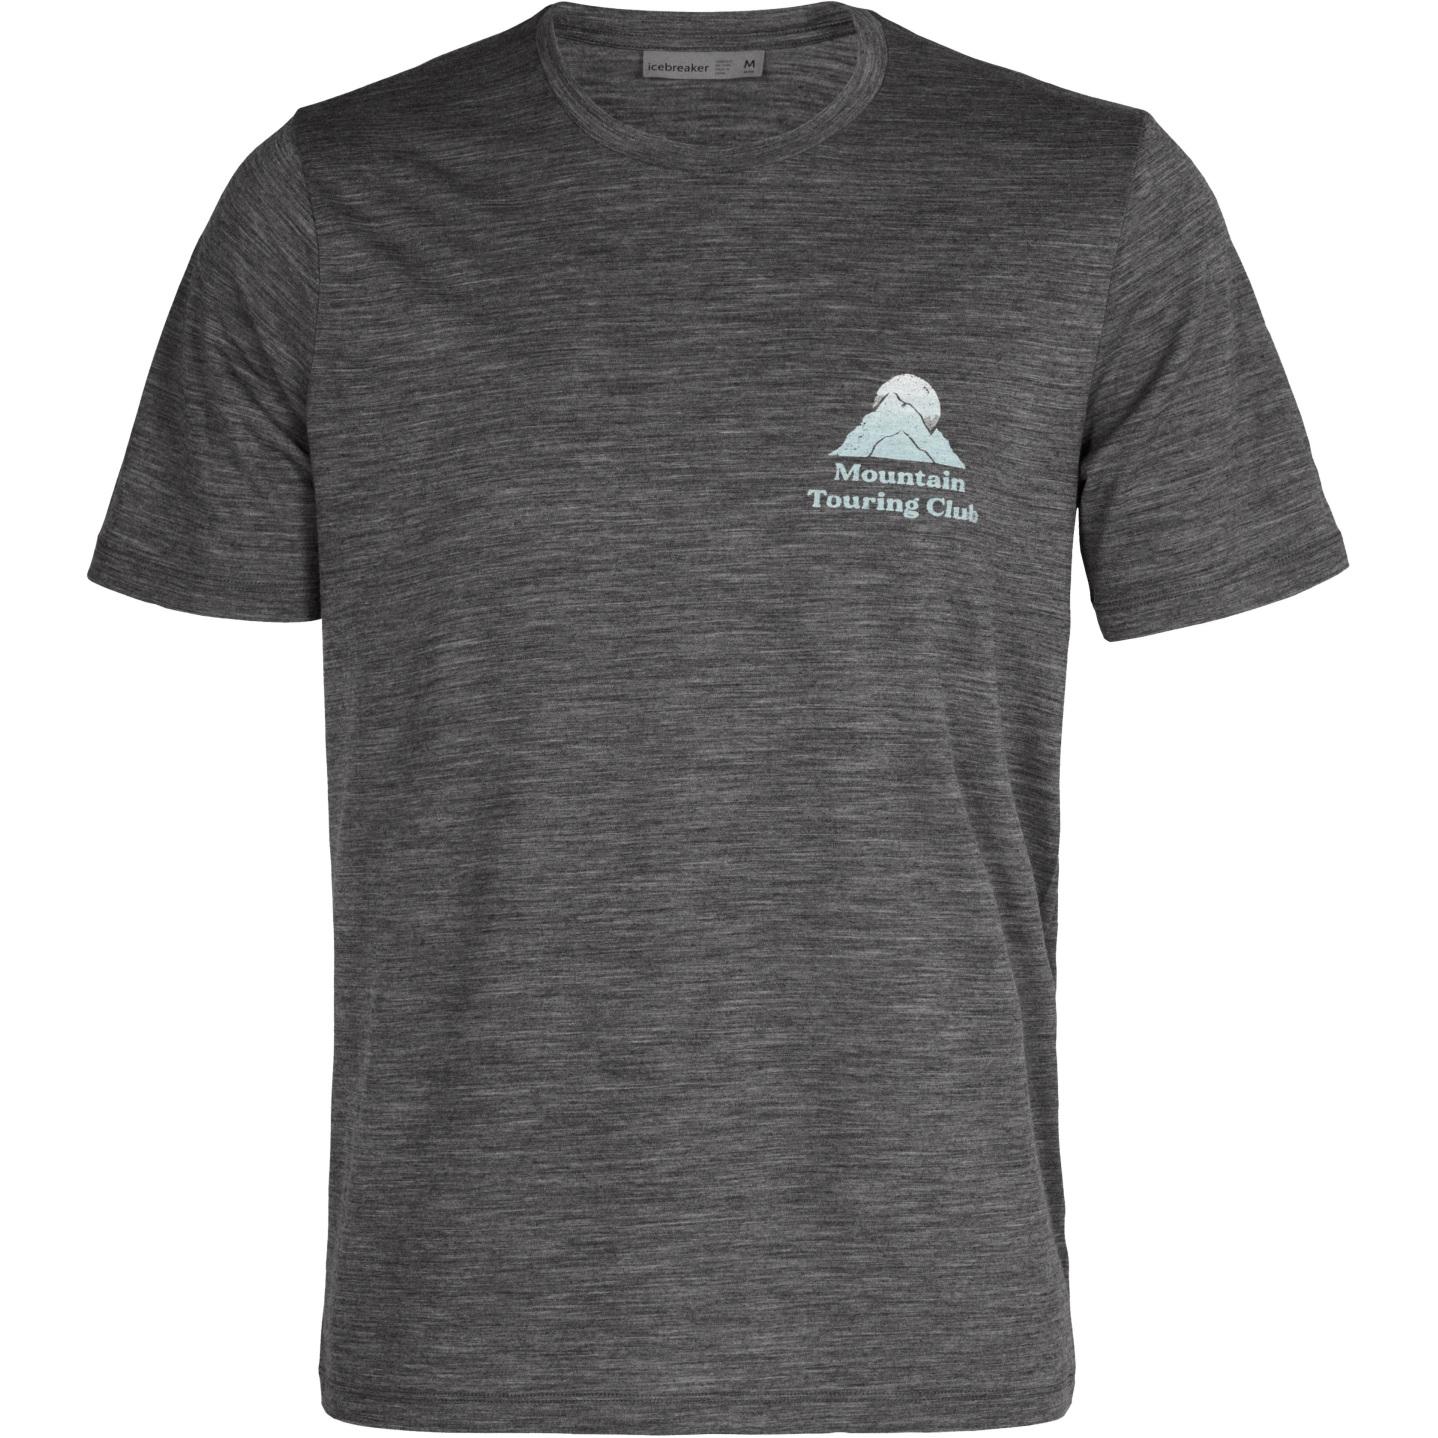 Icebreaker Tech Lite II Touring Club Herren T-Shirt - Gritstone Hthr